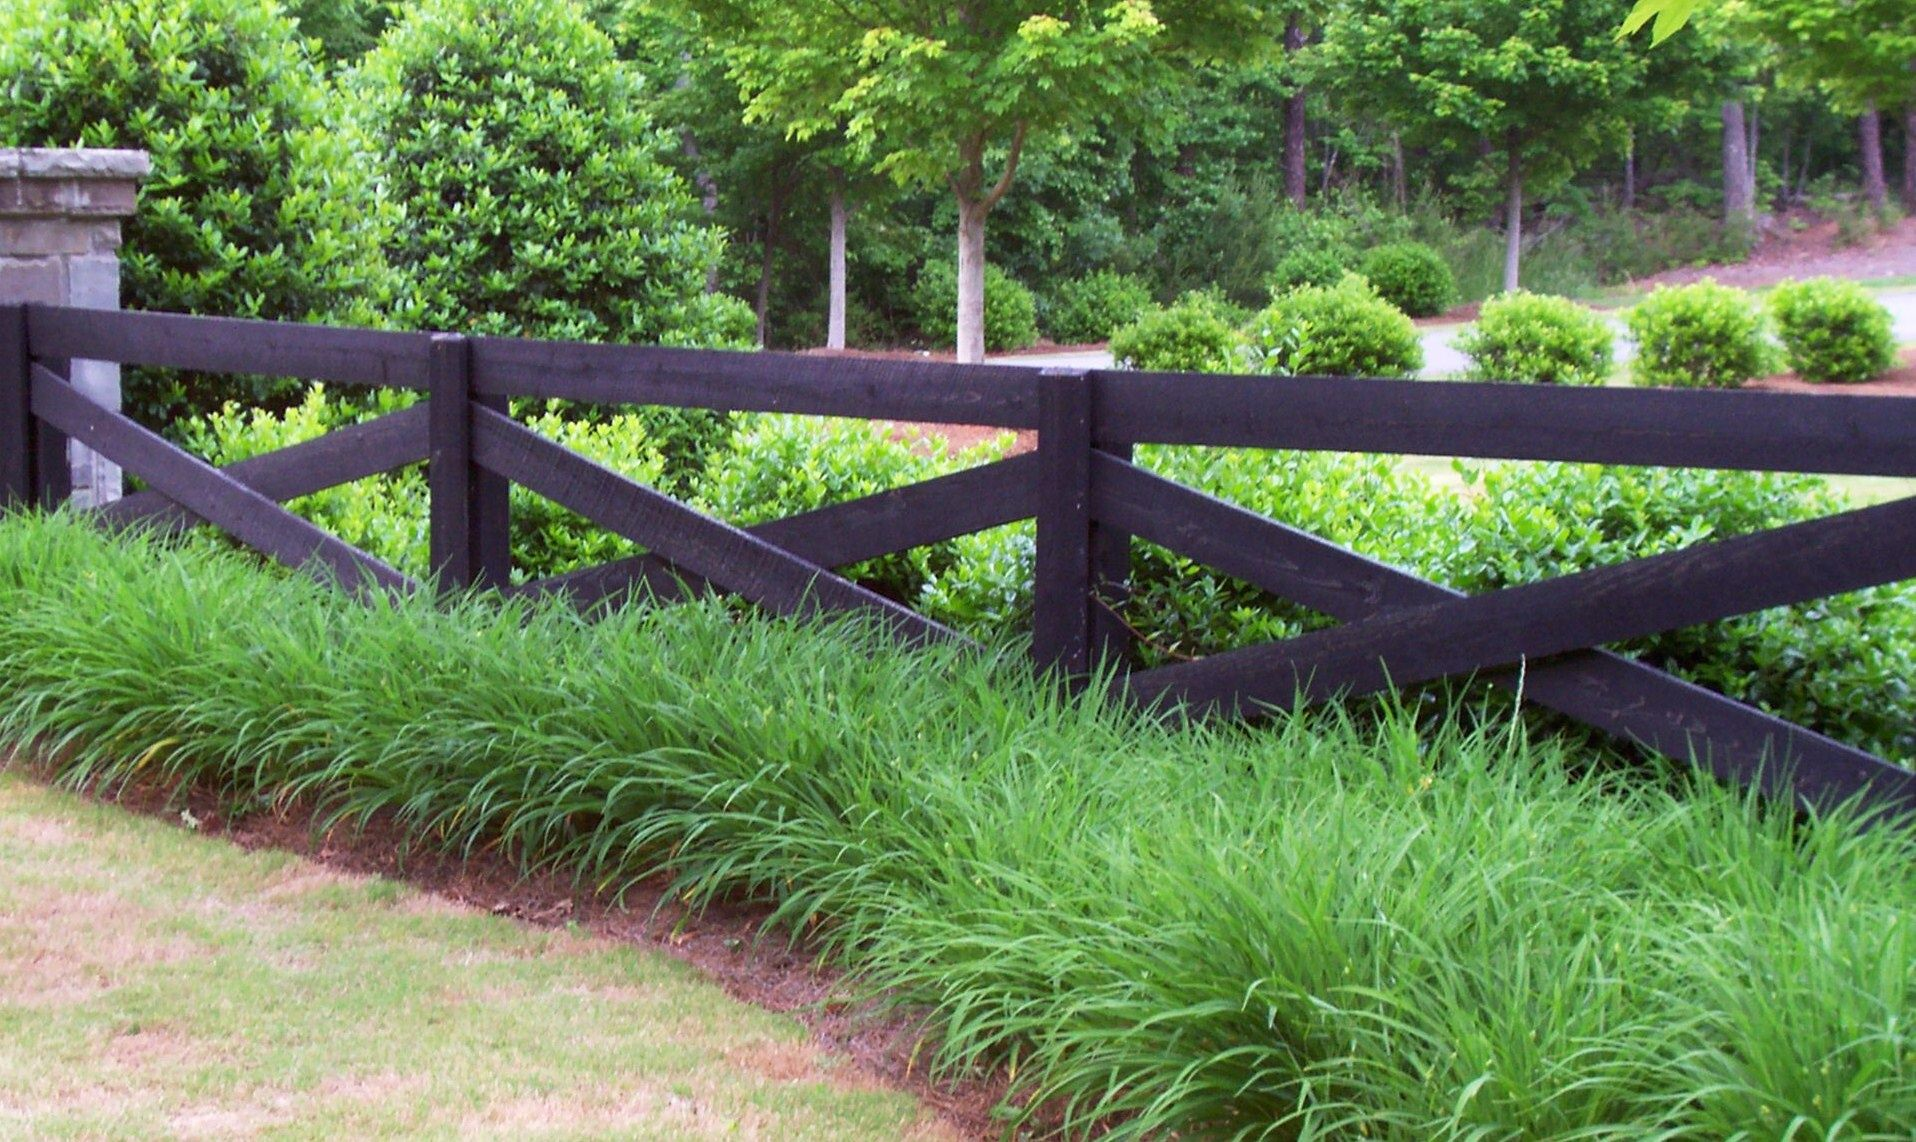 Mossy Oak Fence In 2019 Horse Fencing Fence Farm Fence